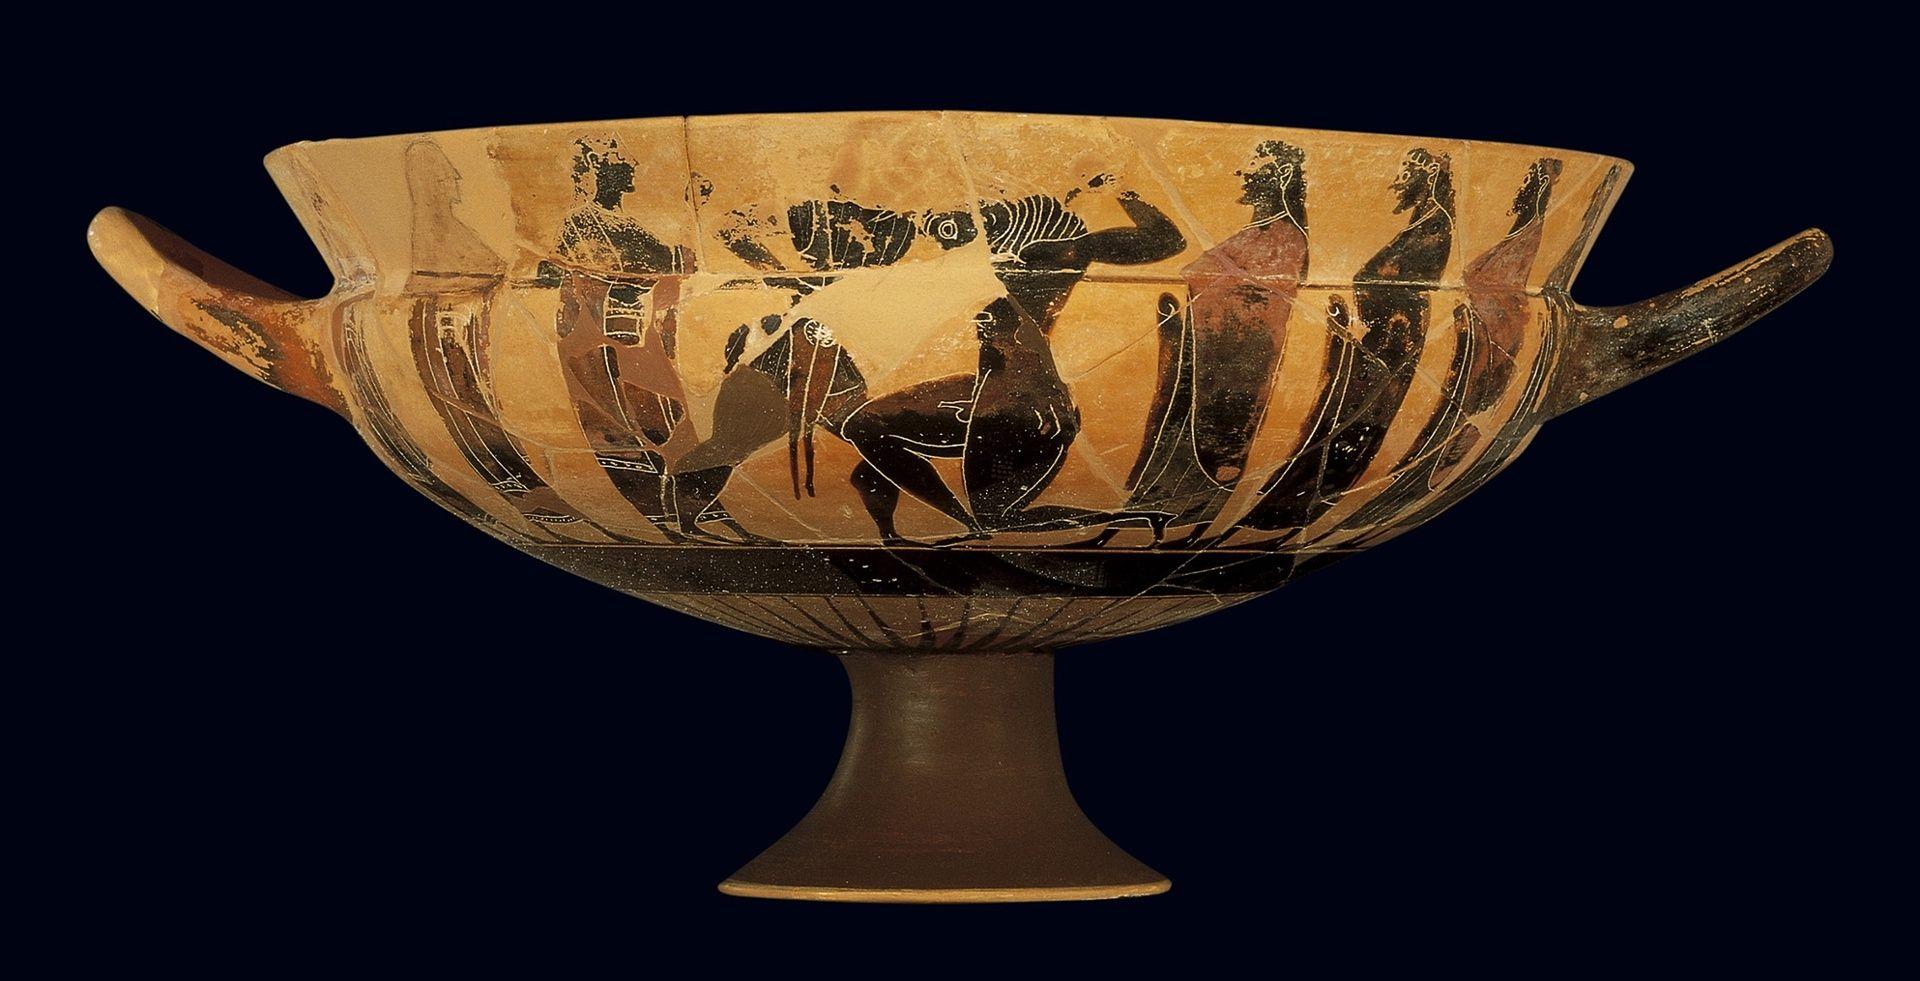 Attic Black-Figure Komast Cup (Getty Museum)